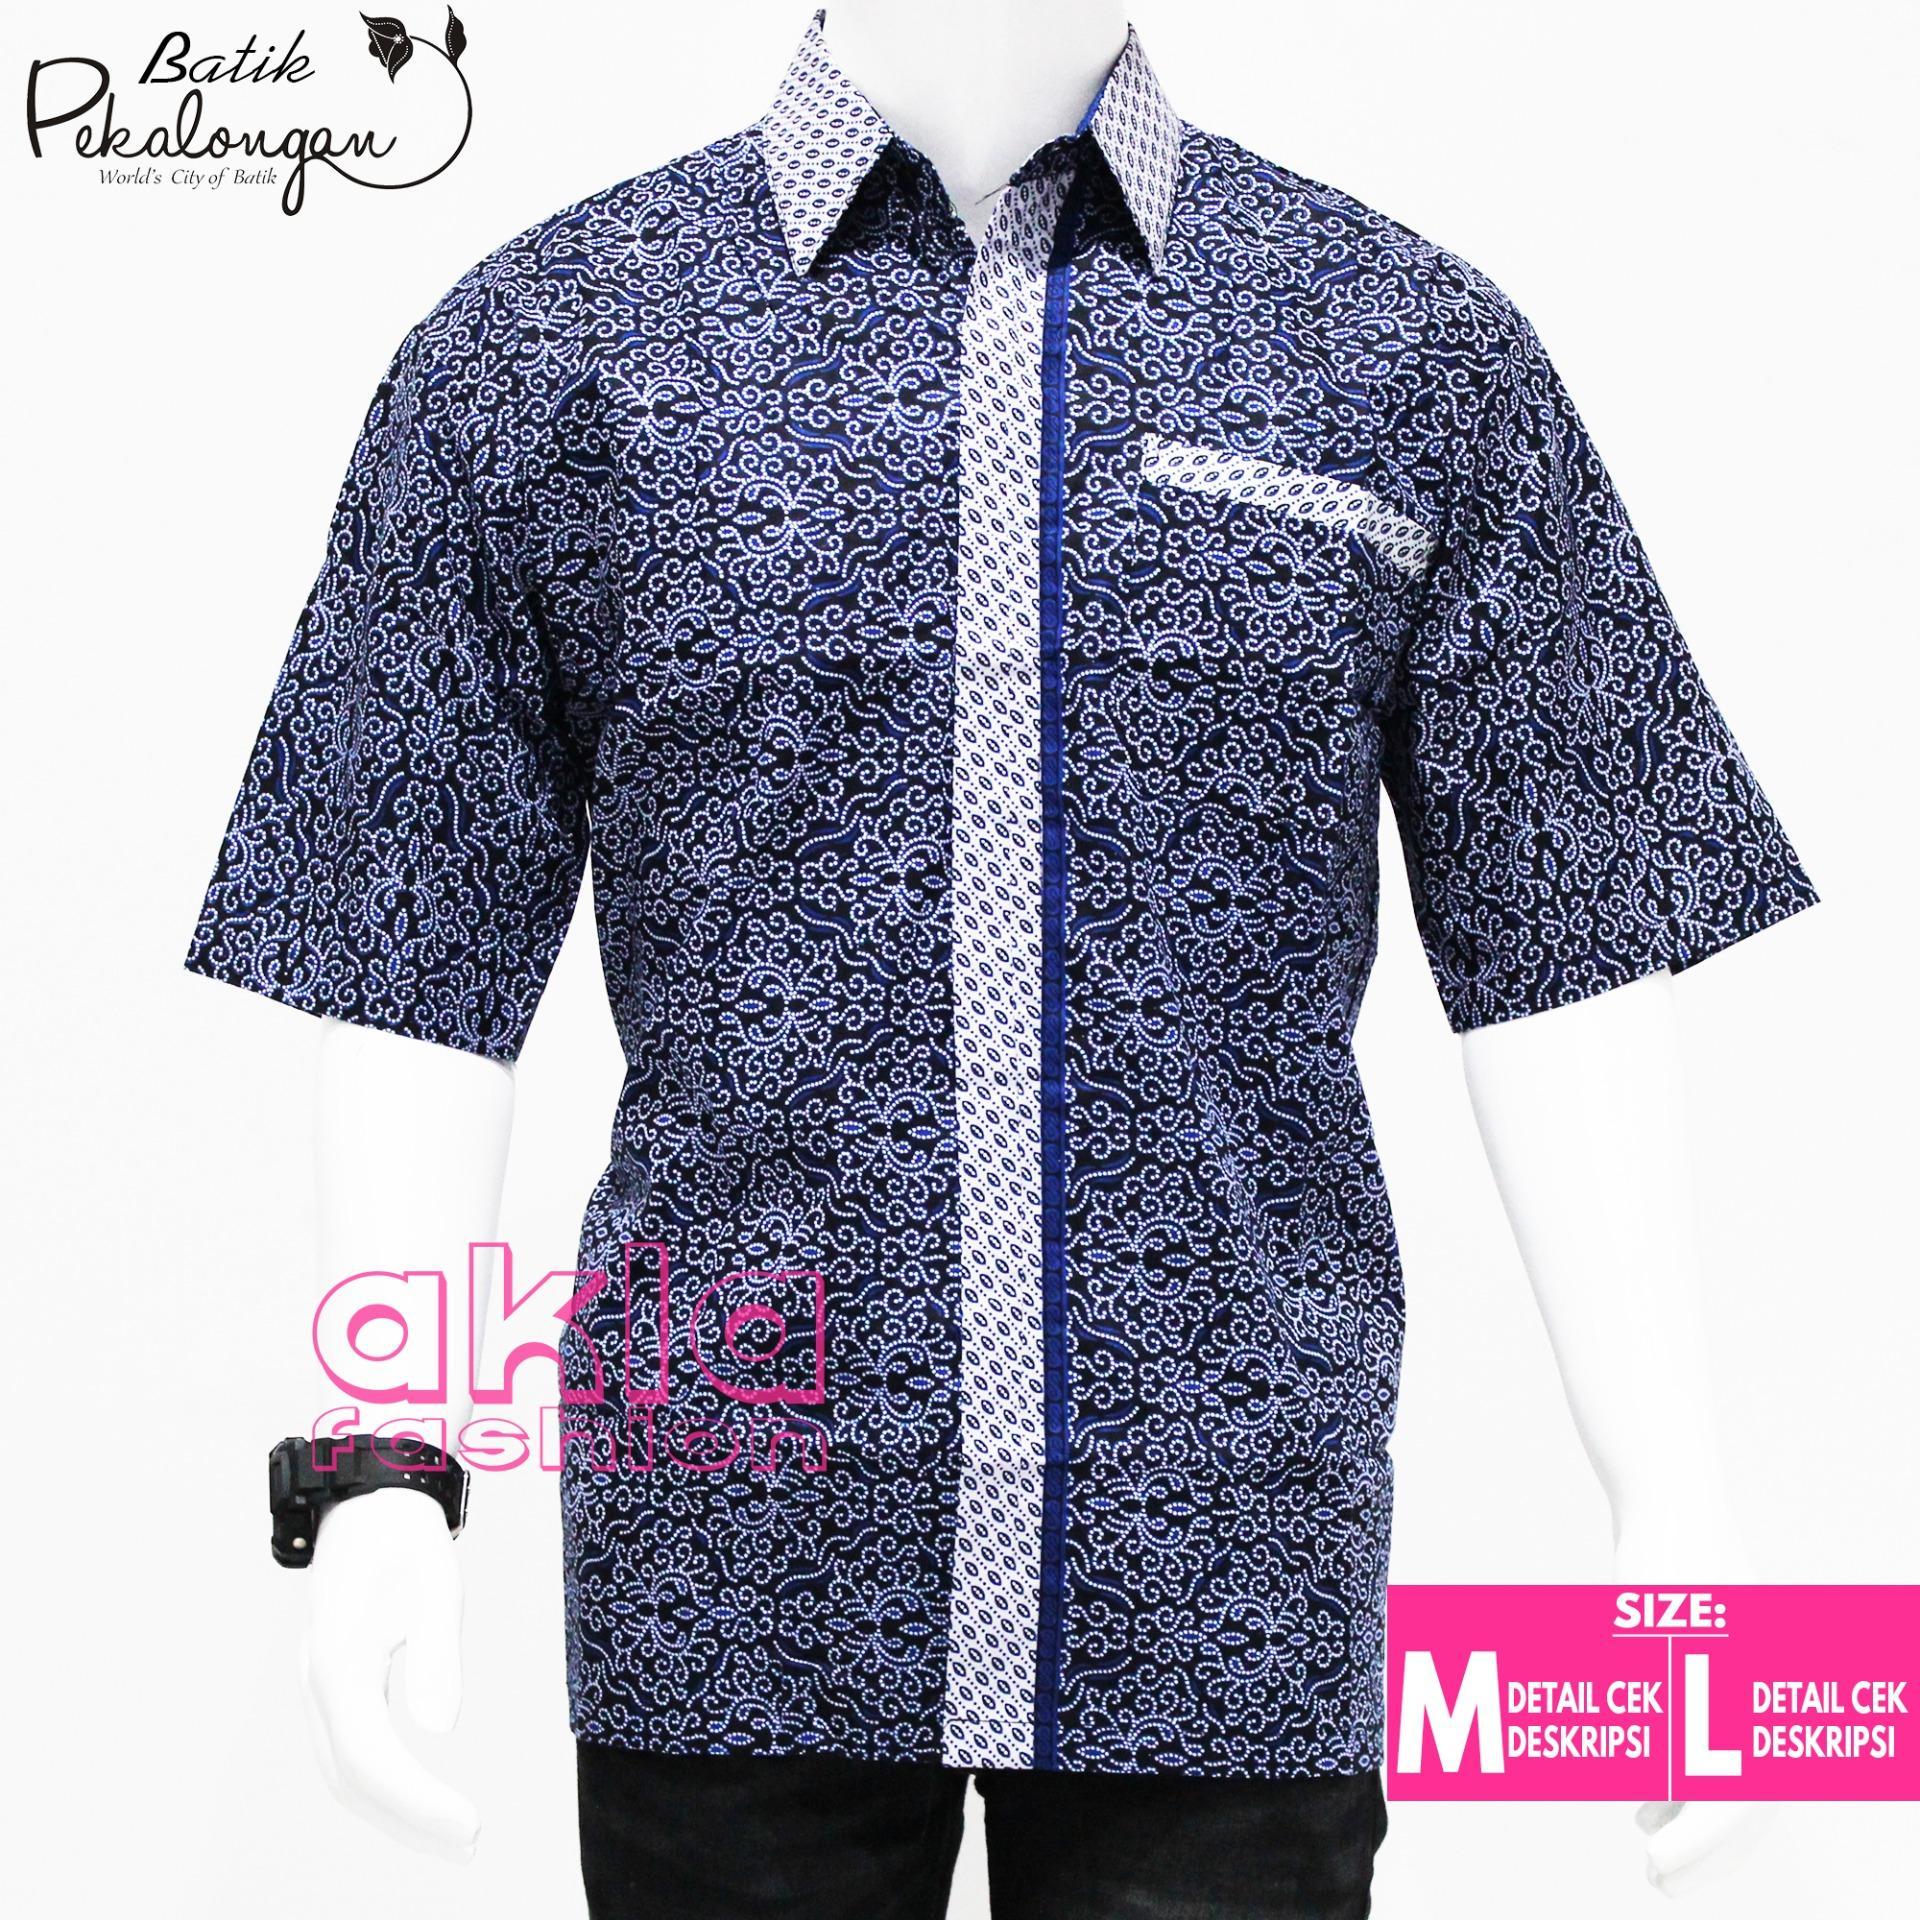 Desain Baju Batik Remaja Cowok | Klopdesain